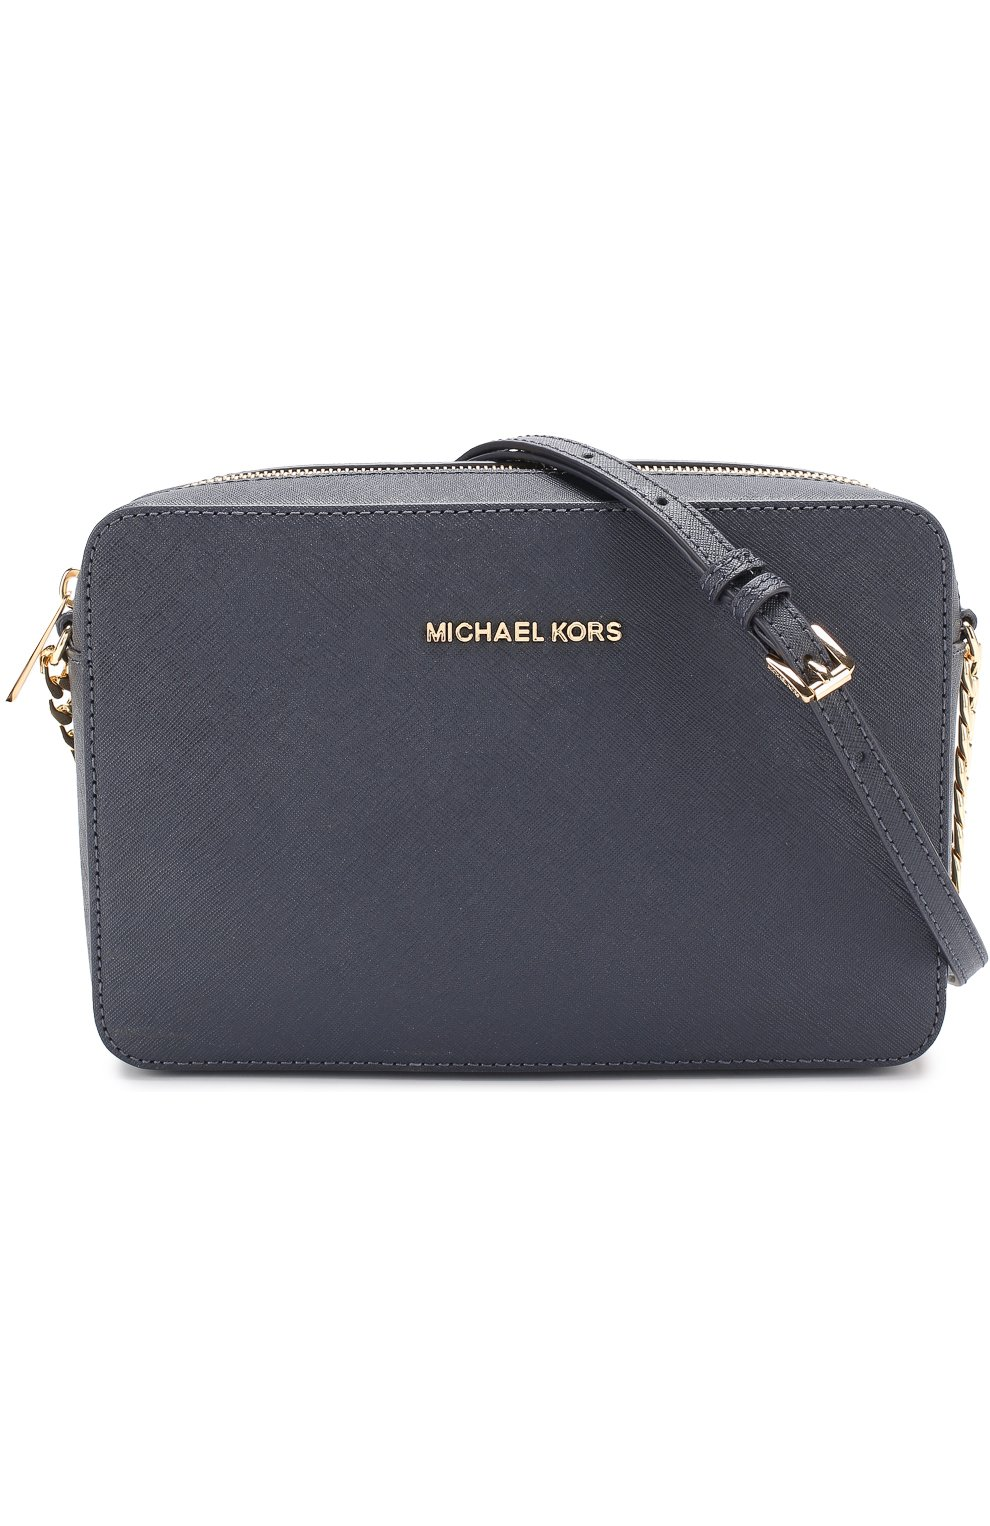 0b22f5fc6343 Сумки MICHAEL Michael Kors по цене от 8 500 руб. купить в интернет-магазине  ЦУМ